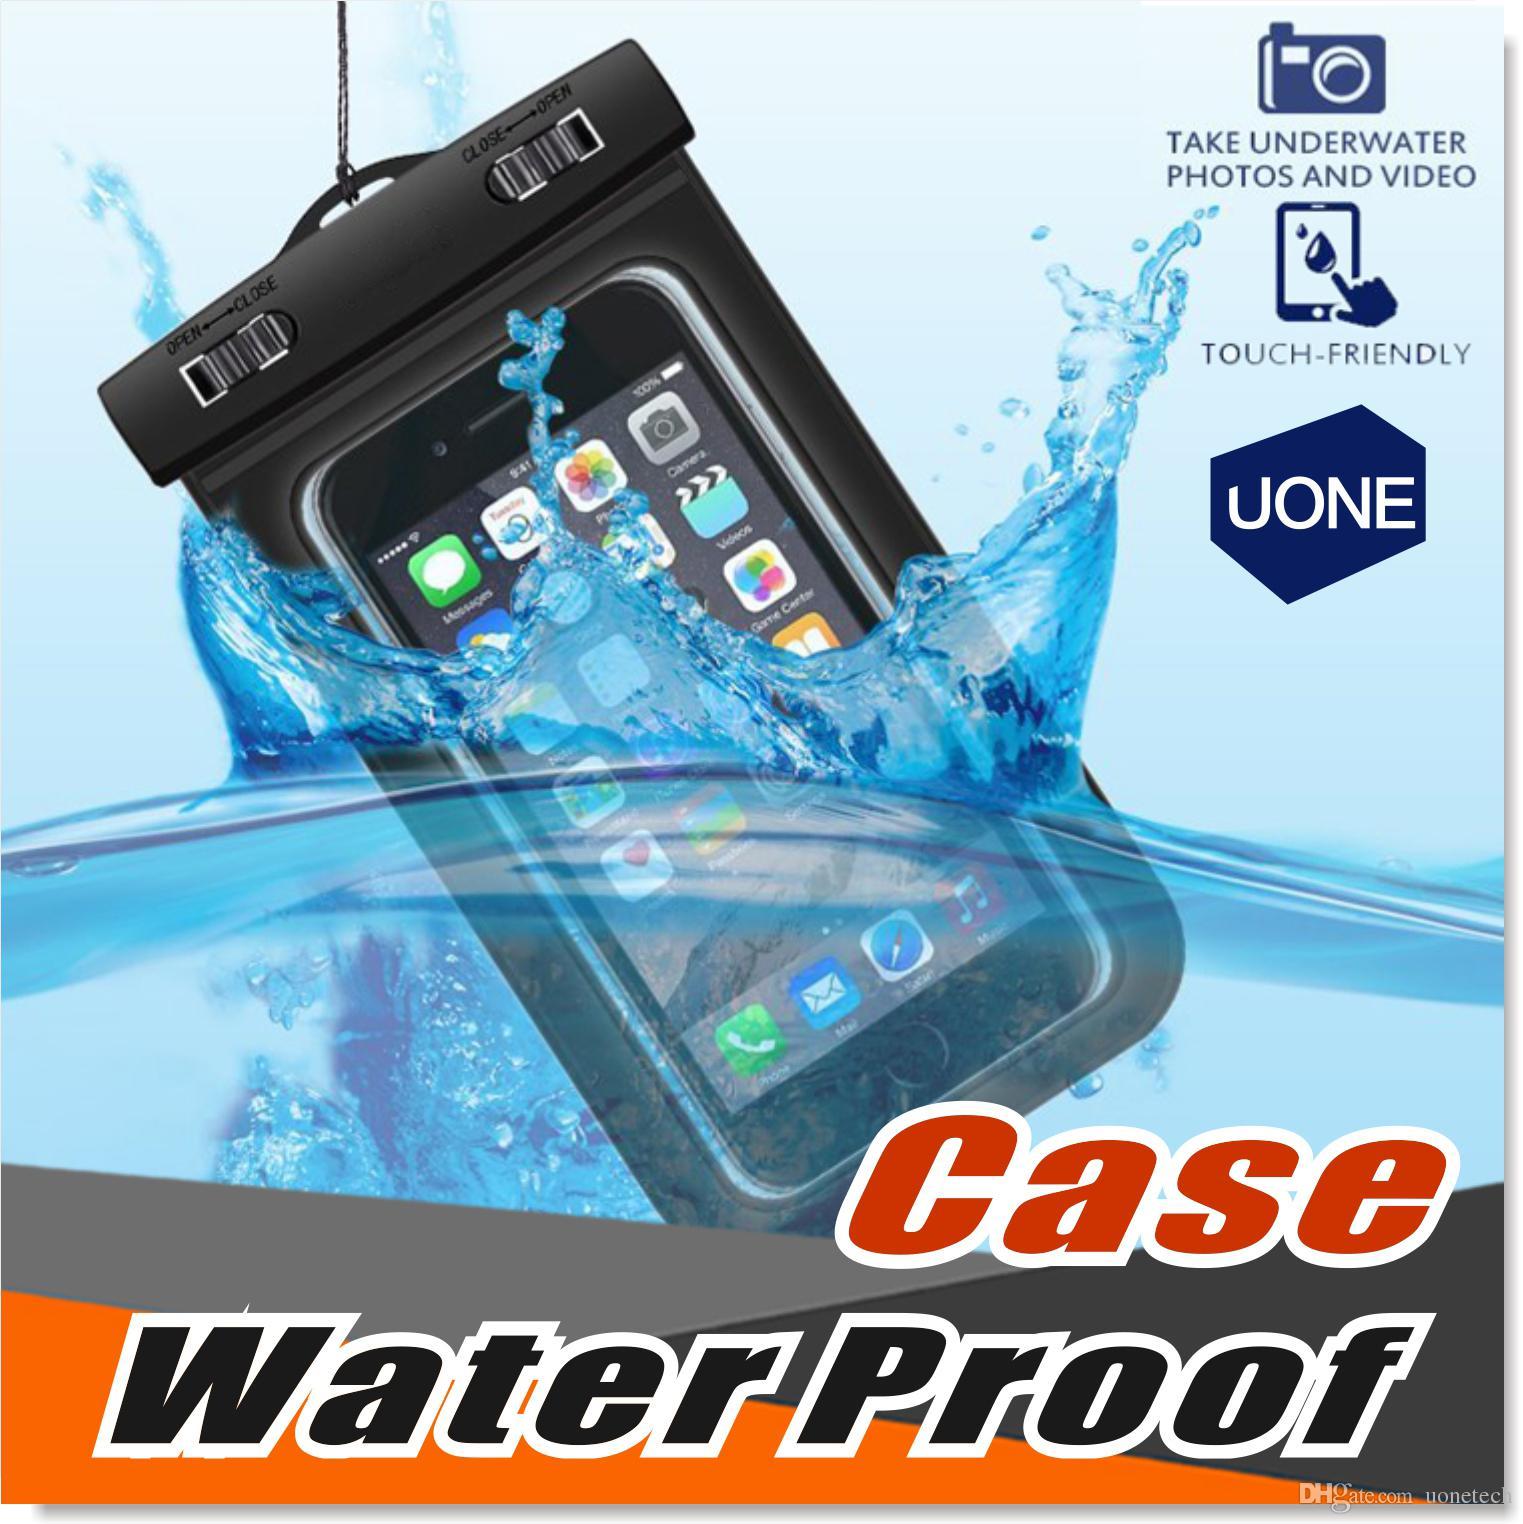 Universal para iPhone 6 7 6s más Samsung S9 S7 impermeable de la caja del teléfono celular bolsa a prueba de agua bolsa seca para teléfonos inteligentes hasta 5,8 pulgadas en diagonal